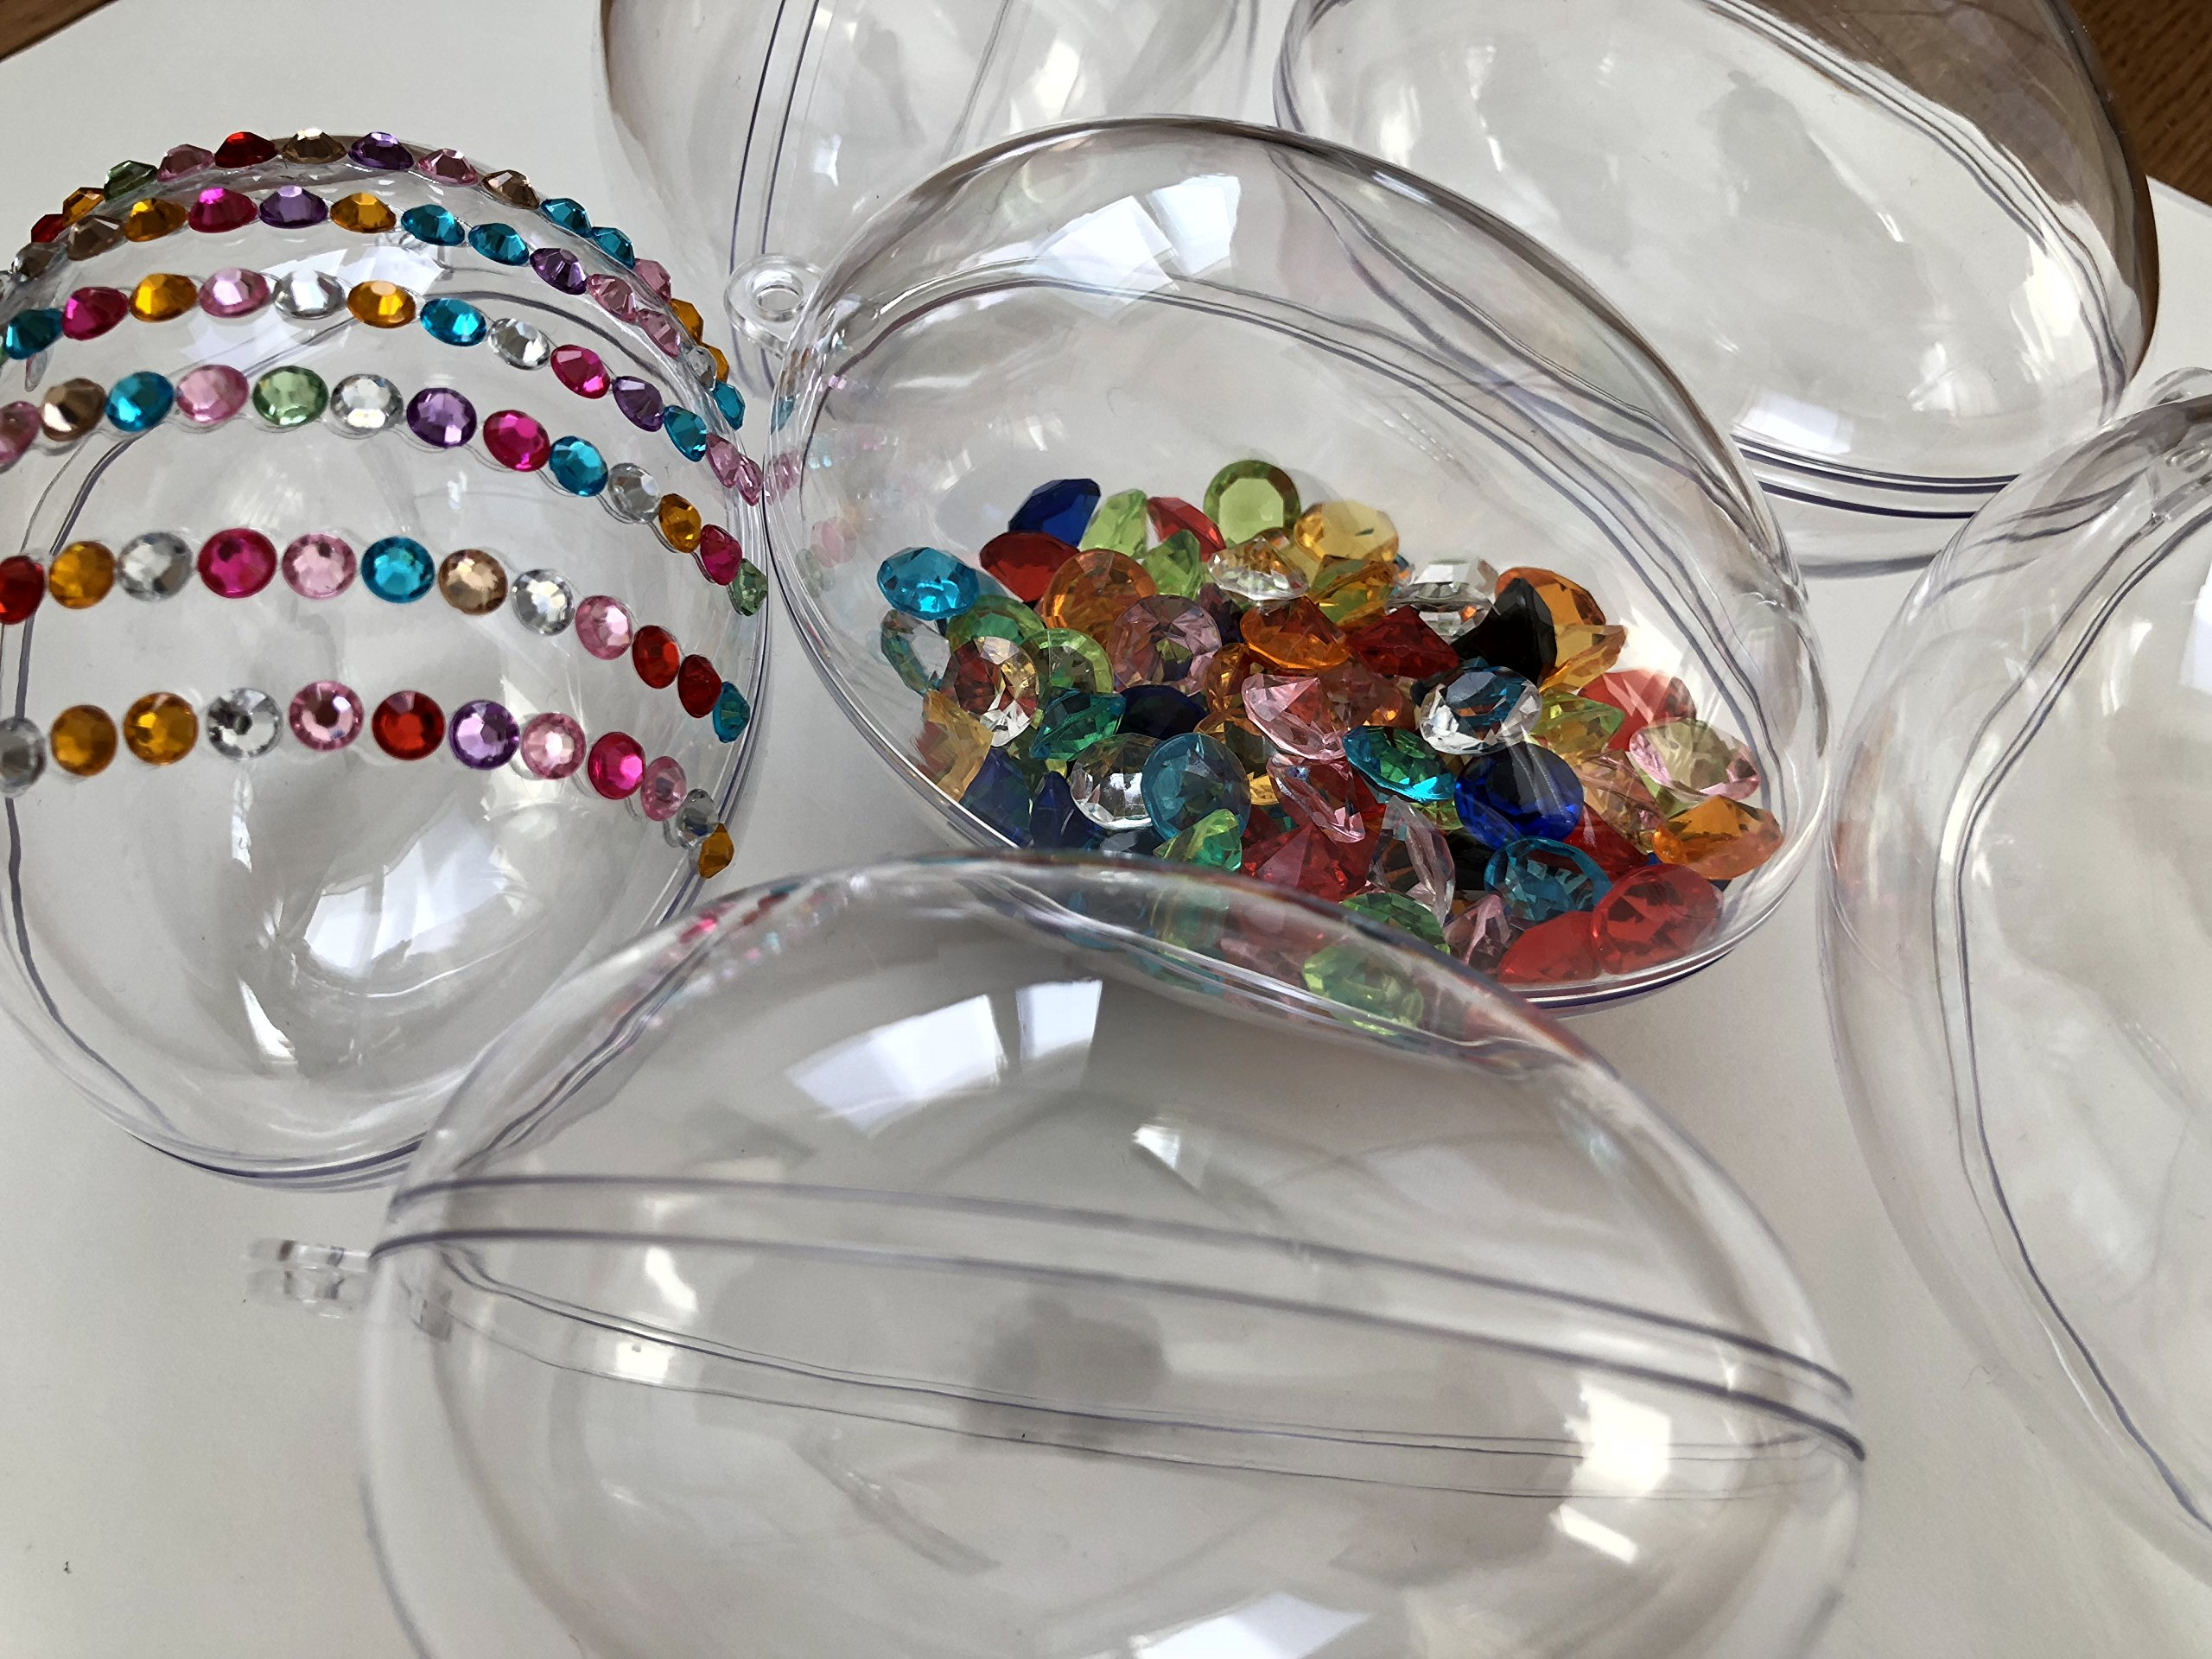 CRYSTAL-KING-10-Acryl-EIE-Ostern-Ei-Ostereier-10cm-Durchmesser-durchsichtig-Acryl-Kugel-Aufhngen-Plastik-Ostereier-Acryl-Form-transparente-Kunststoff-Kugel-zum-Befllen-Bastel-Ei-Osterei